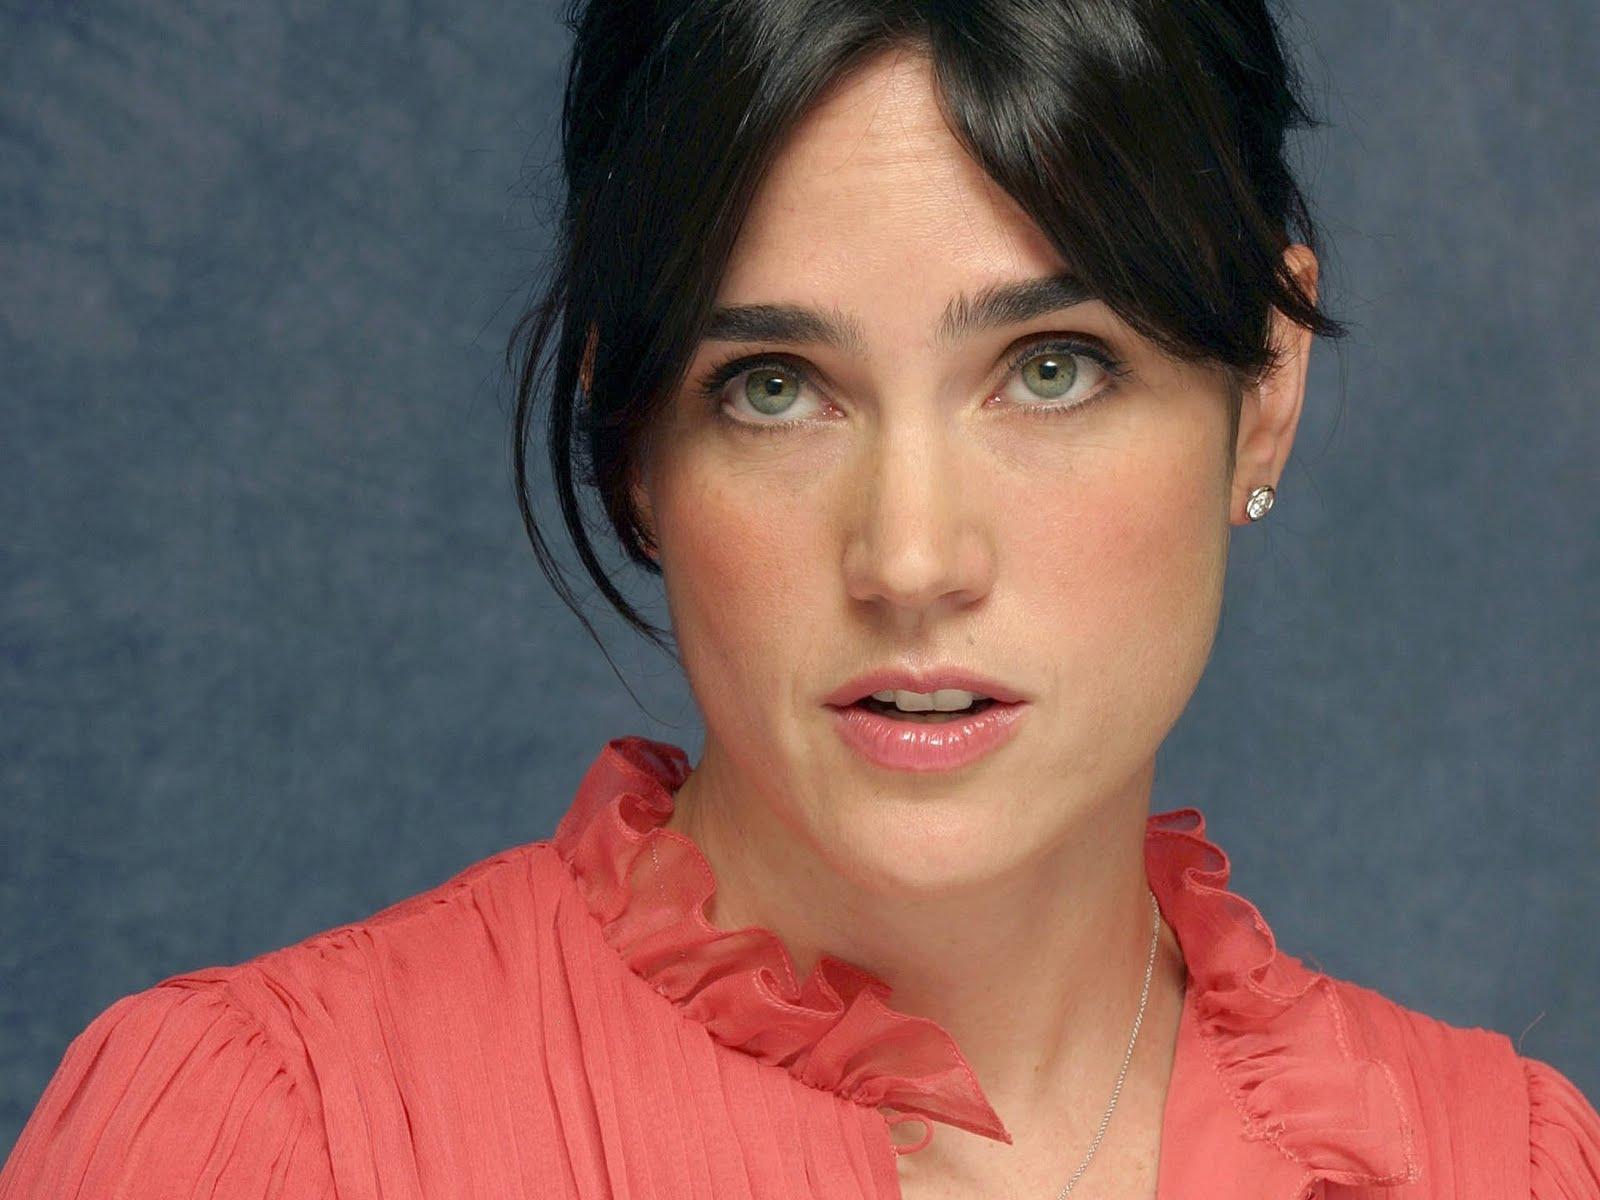 http://4.bp.blogspot.com/-QO9CrNDzZ_s/Tbup40aH4PI/AAAAAAAAObY/JGBNbC12Wj8/s1600/american_film_actress_Jennifer_Connelly_wallpaper%2B%25282%2529.jpg